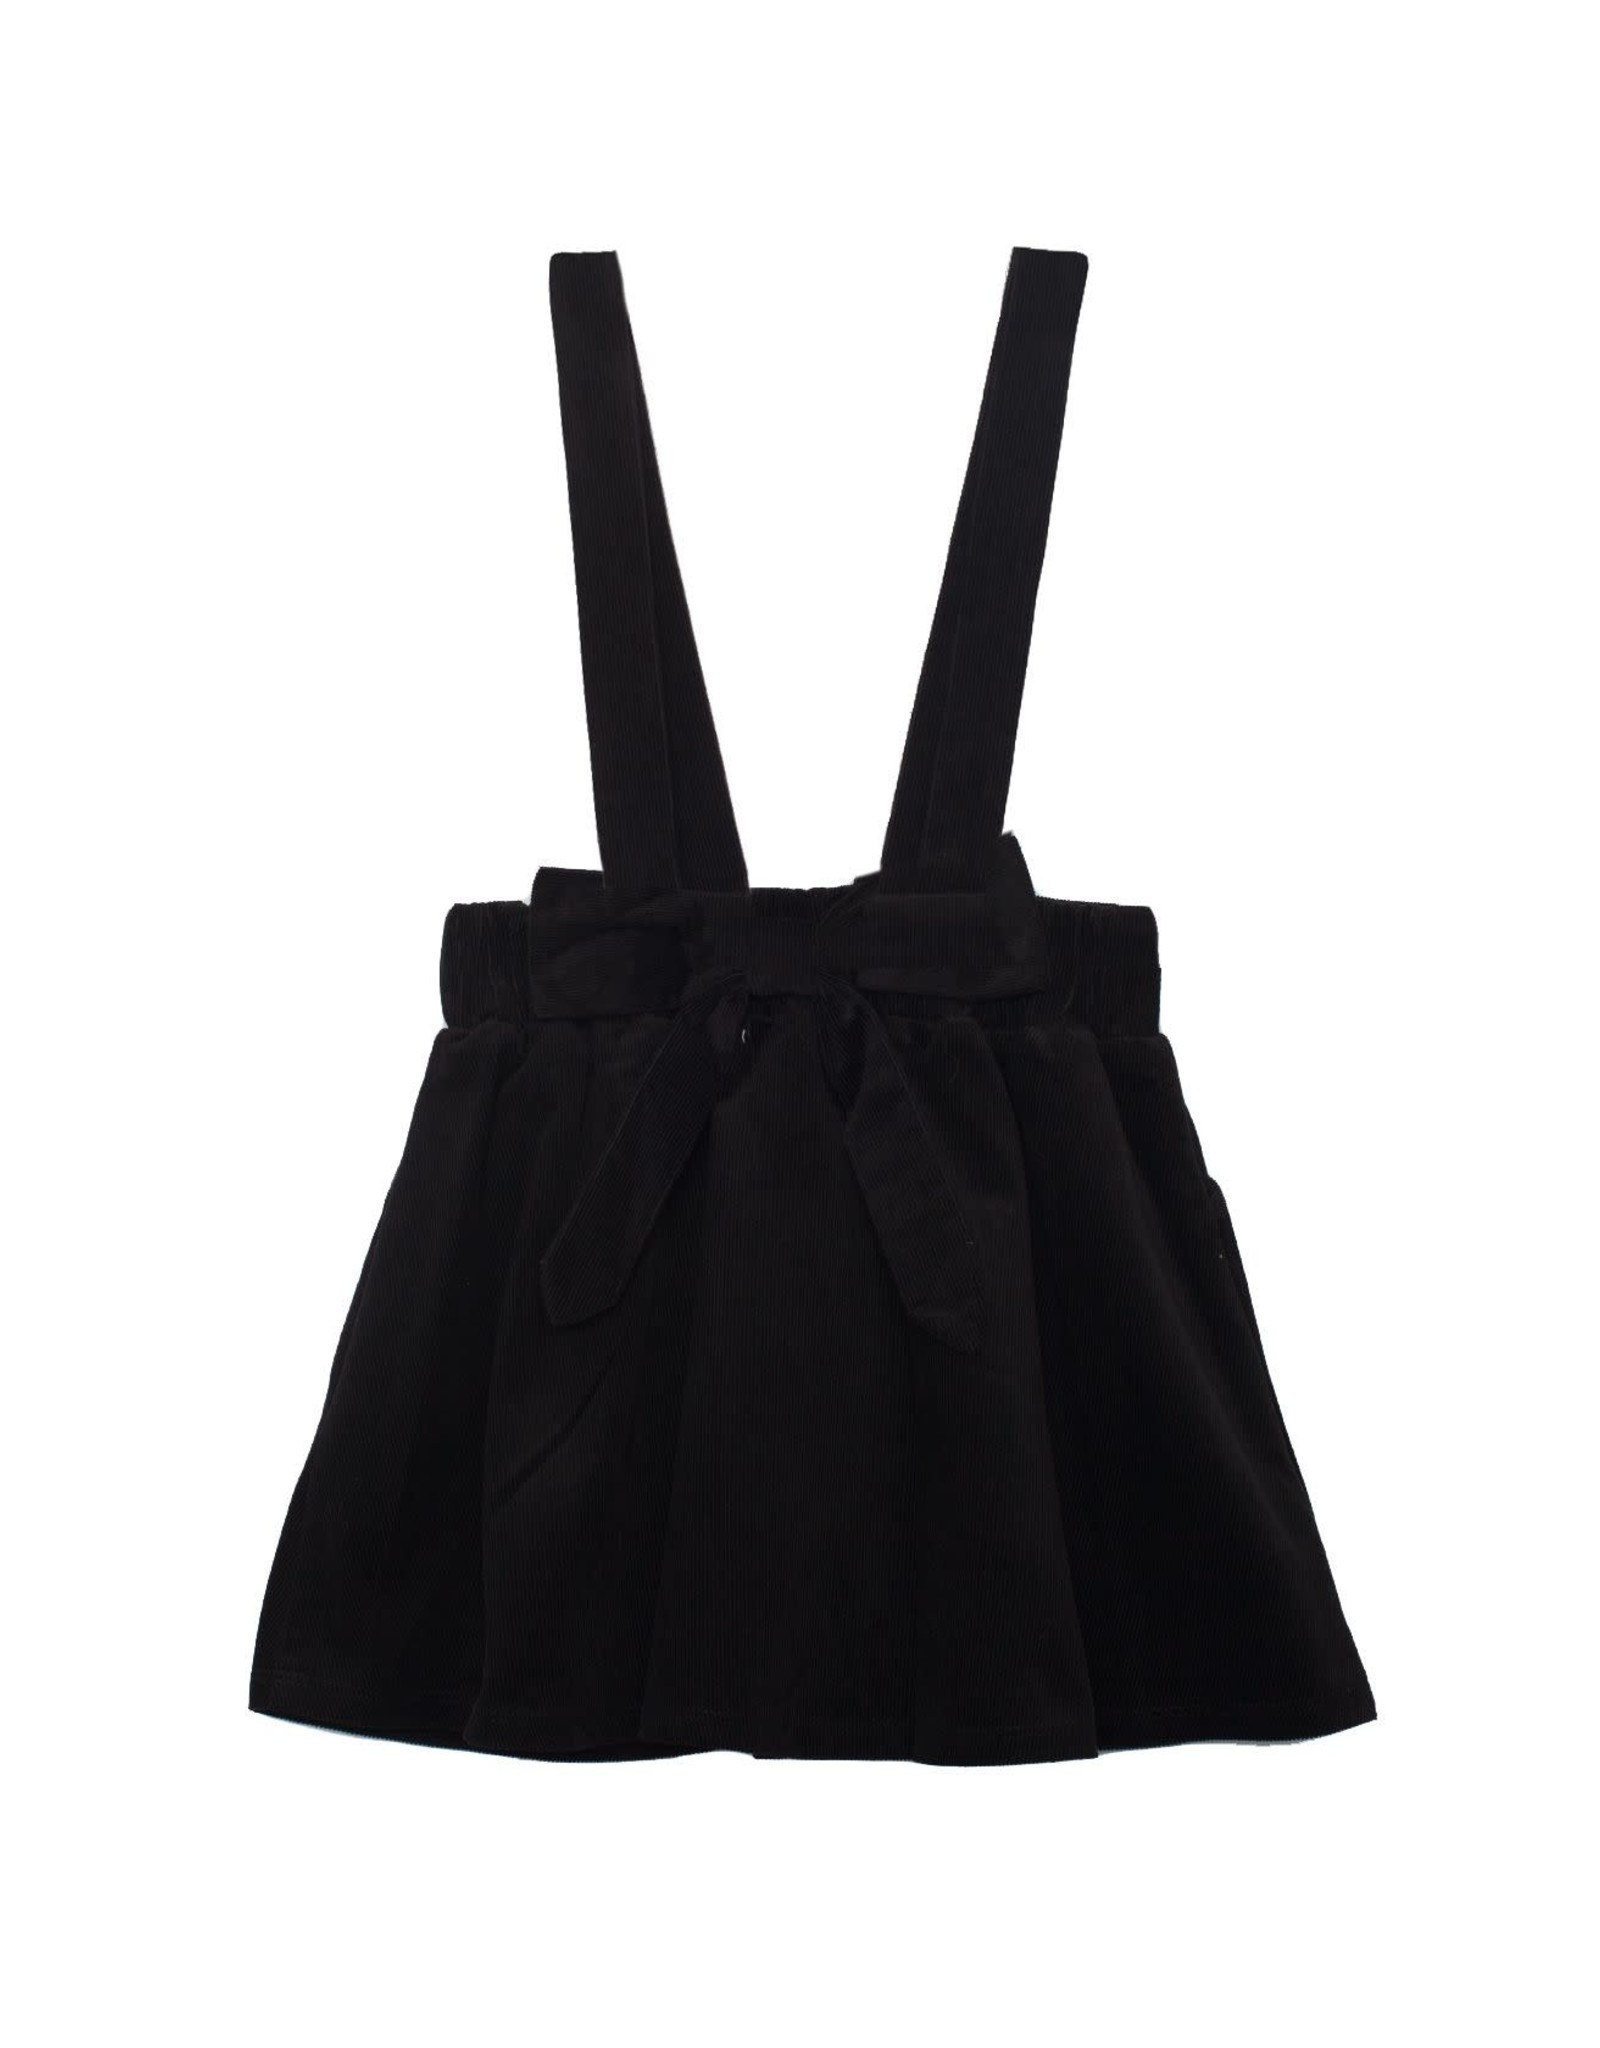 Mabel & Honey Mabel & Honey- Corduroy Jumper Skirt: Black